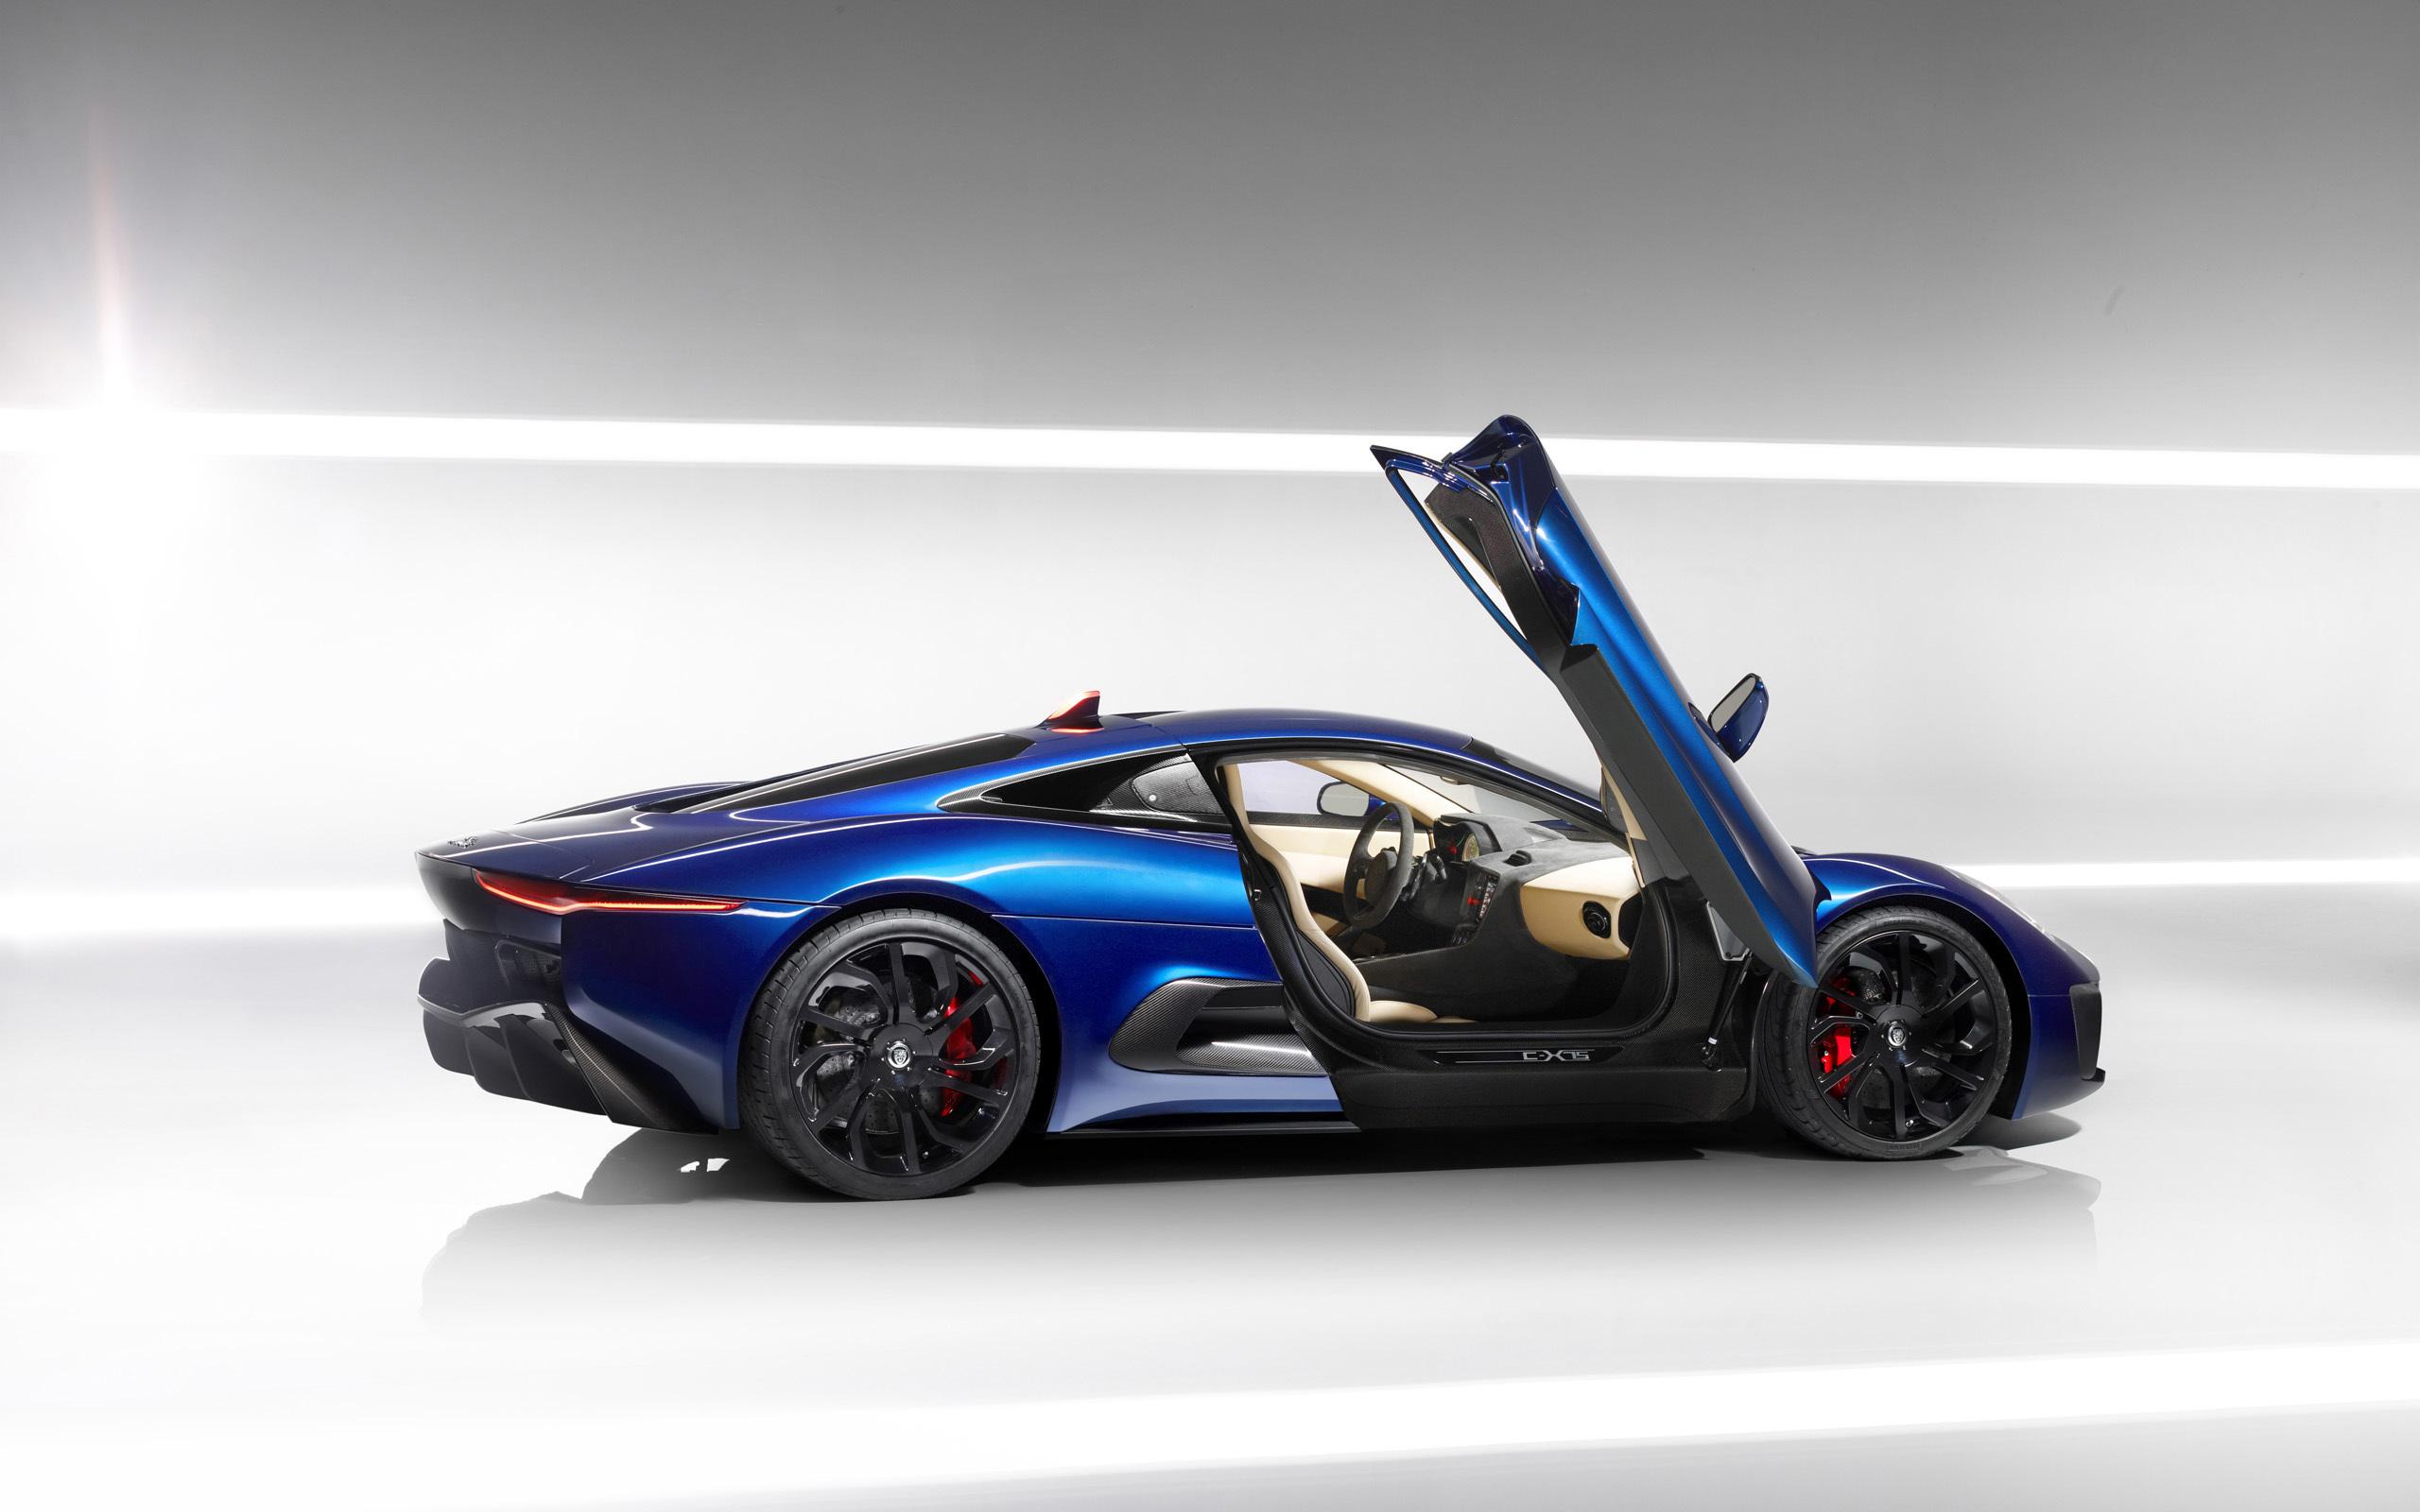 15 Stunning HD Jaguar Wallpapers